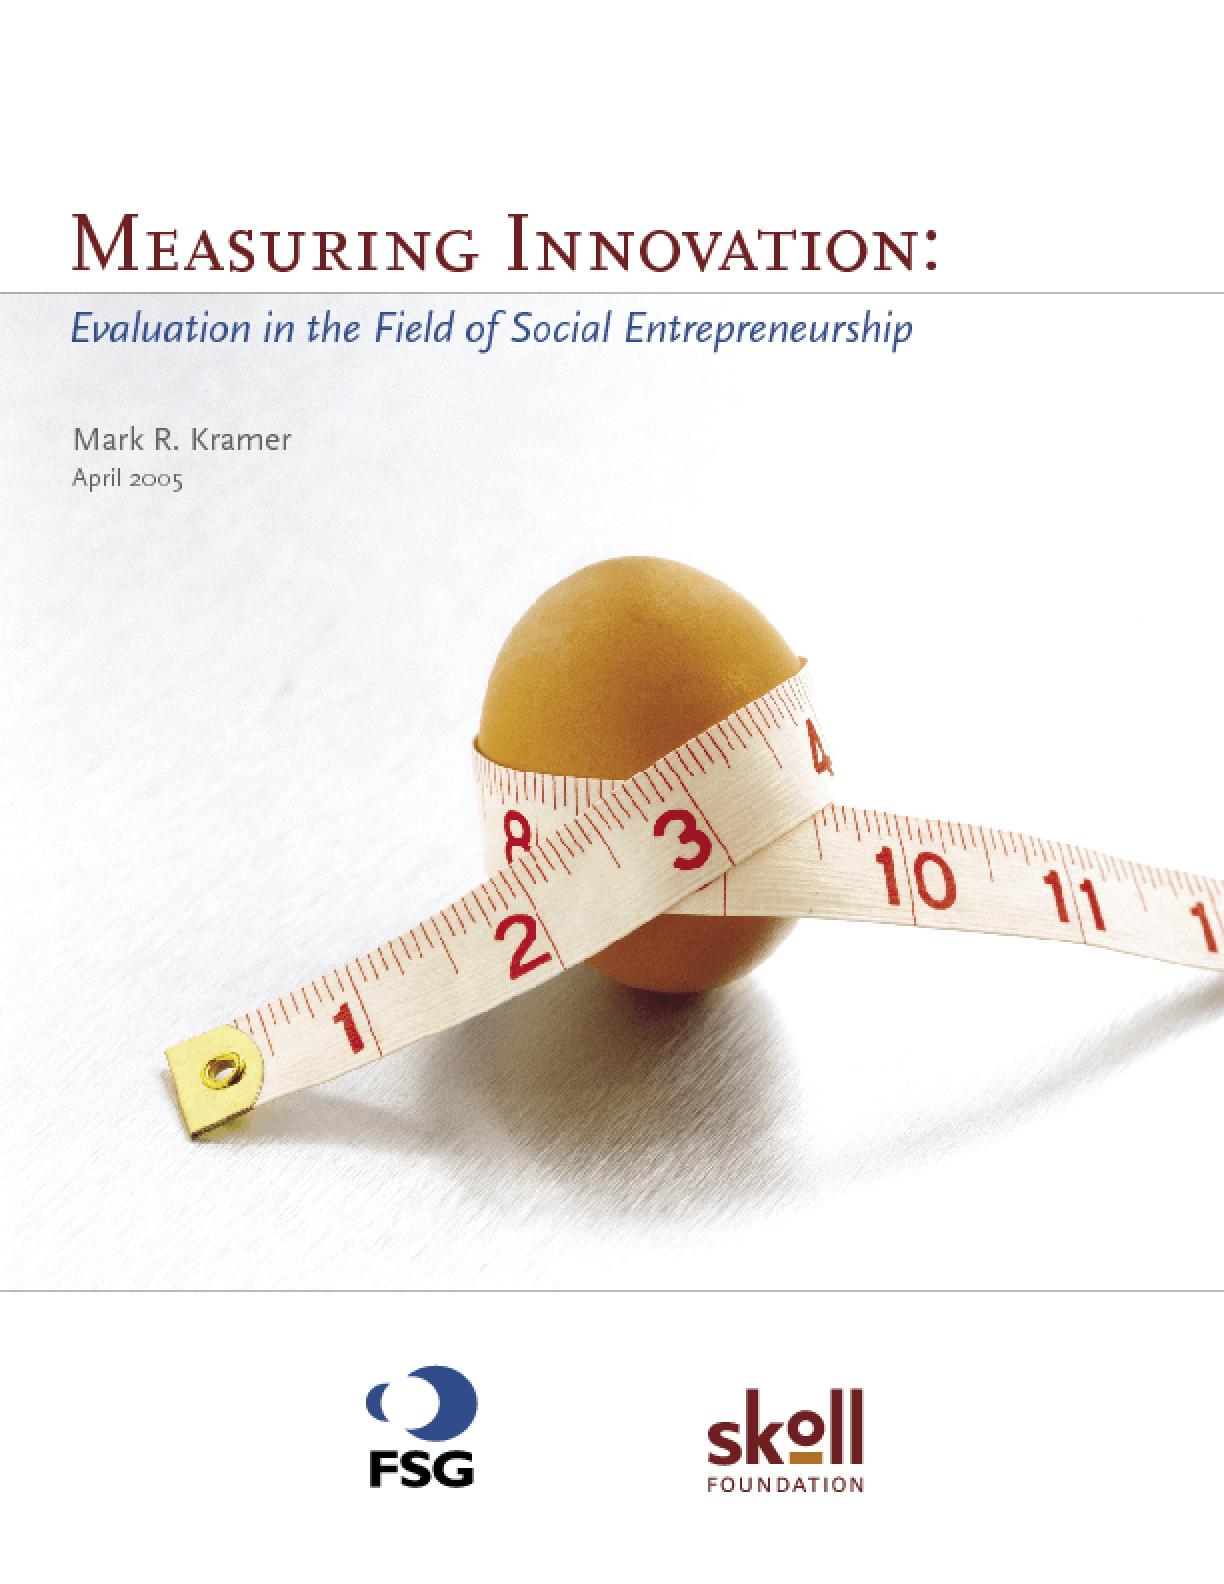 Measuring Innovation: Evaluation in the Field of Social Entrepreneurship